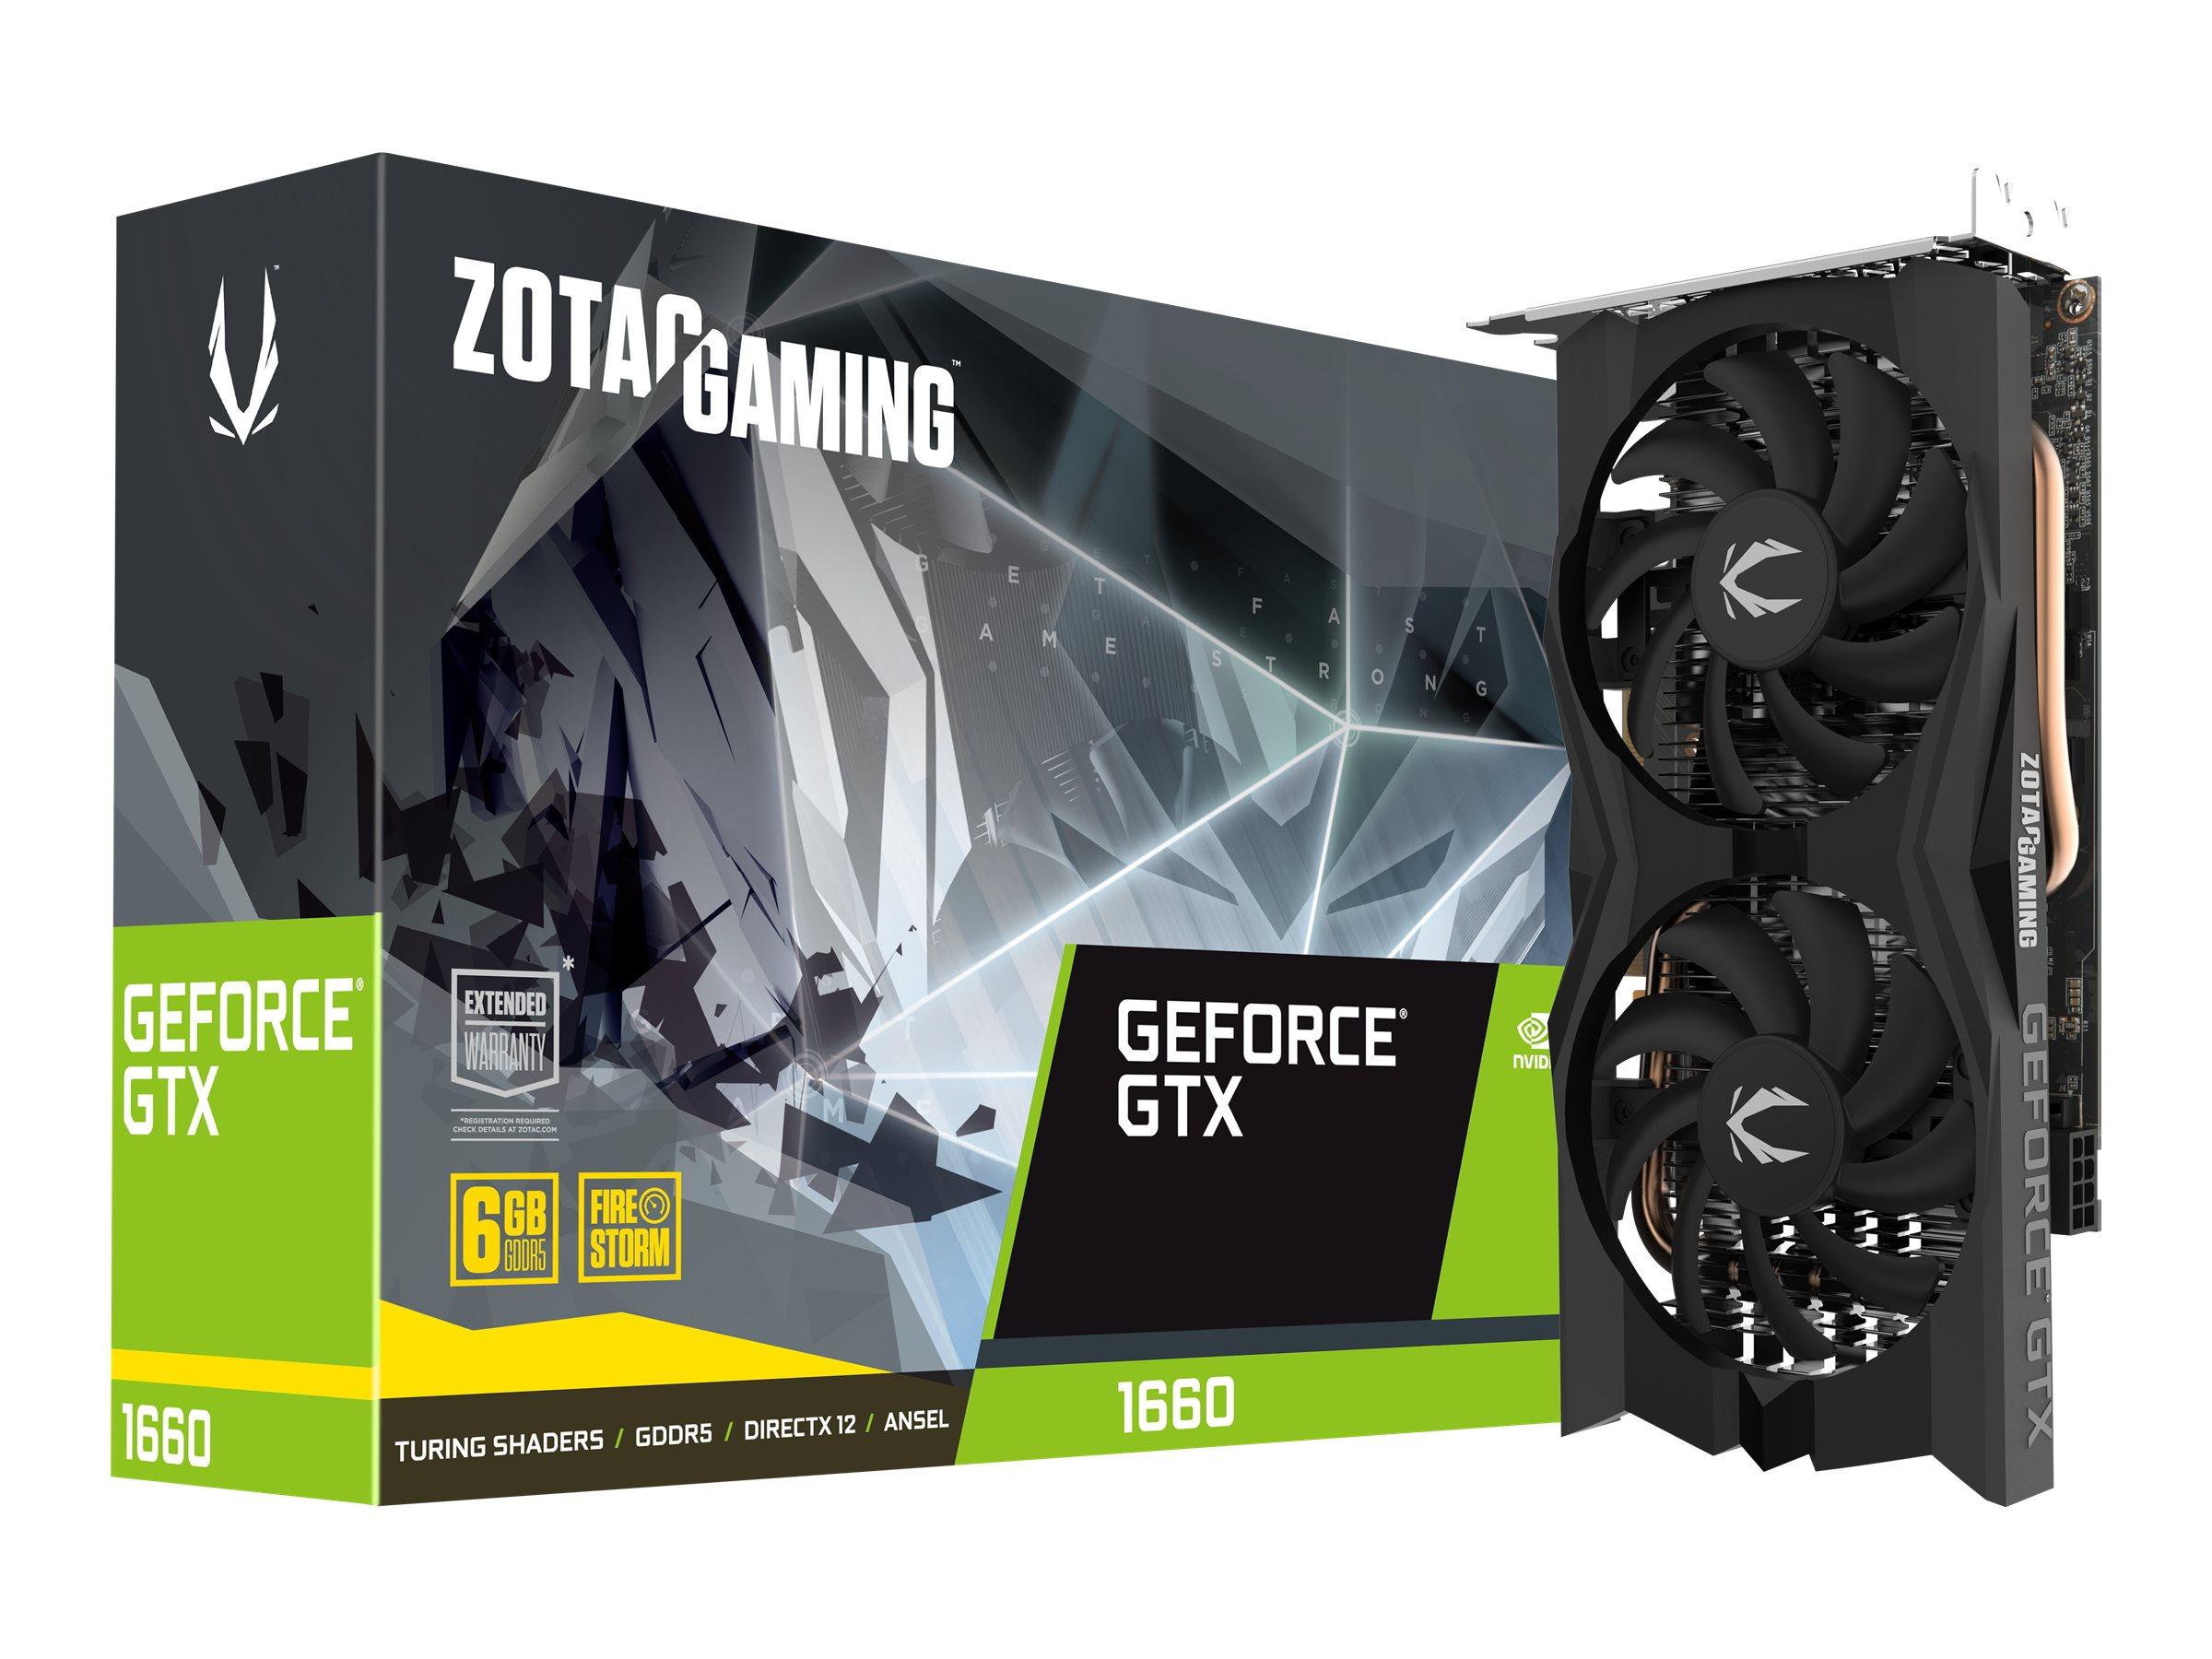 ZOTAC GAMING GeForce GTX 1660 Twin Fan - Grafikkarten - GF GTX 1660 - 6 GB GDDR5 - PCIe 3.0 x16 - HDMI, 3 x DisplayPort